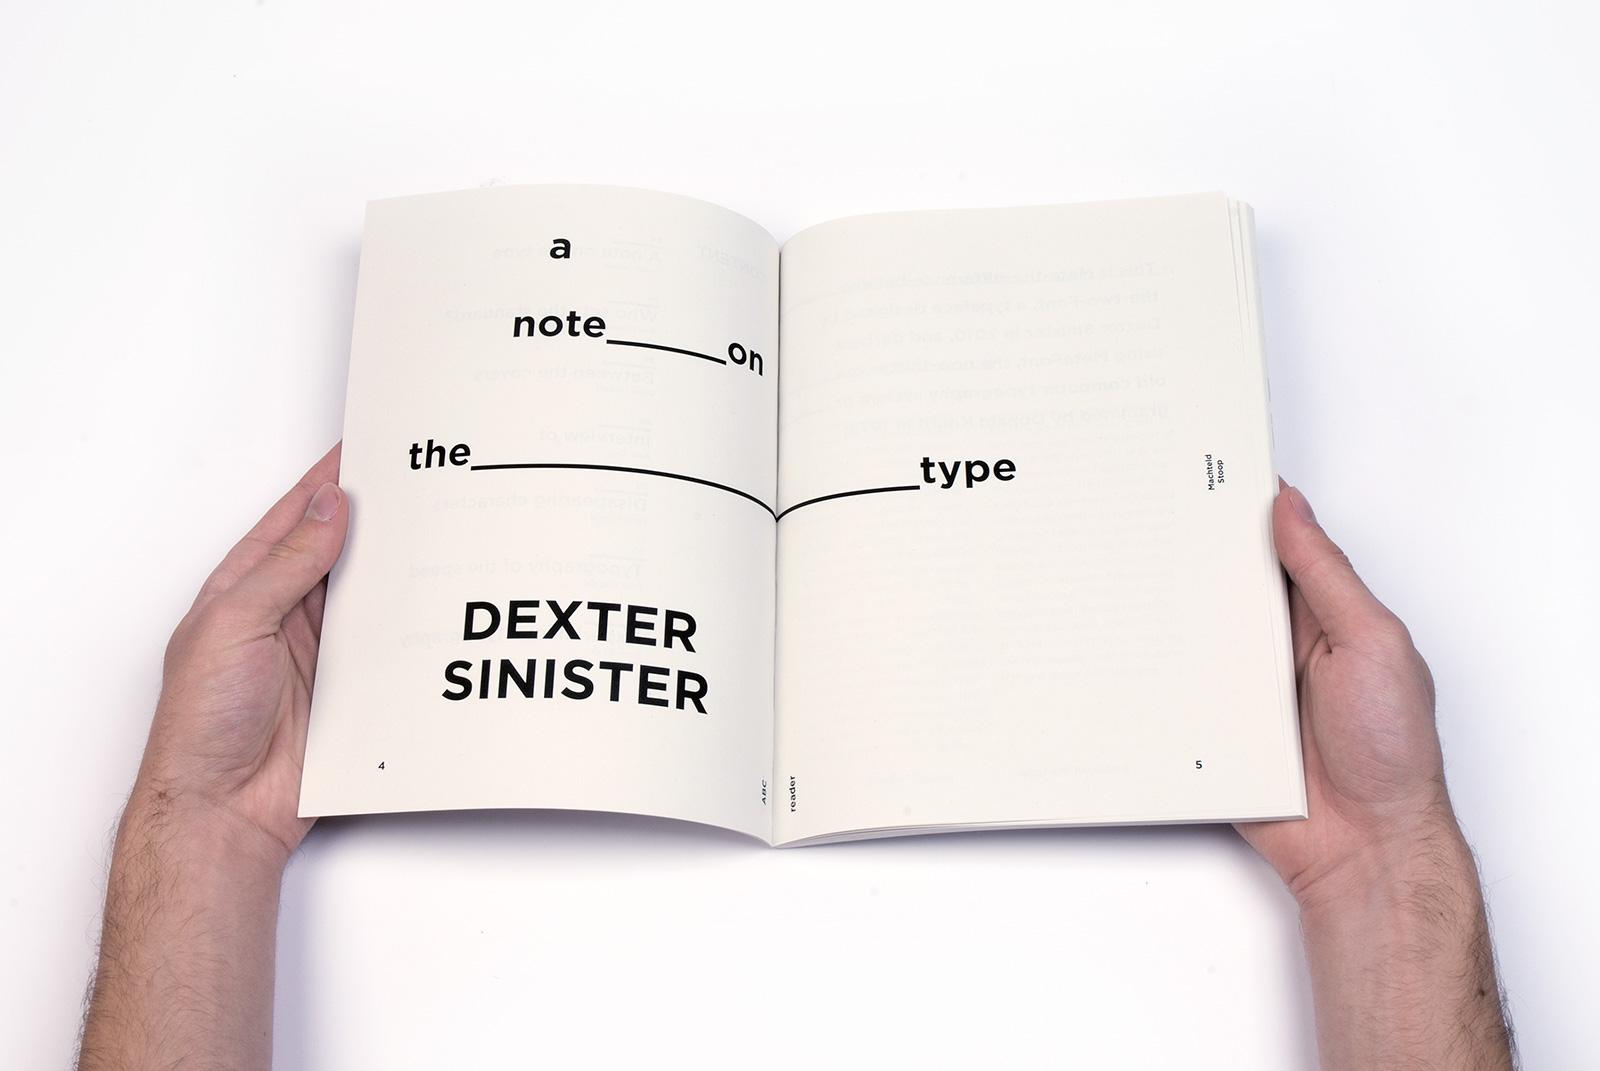 abc-typographic-reader-book-wilco-monen-02.jpg